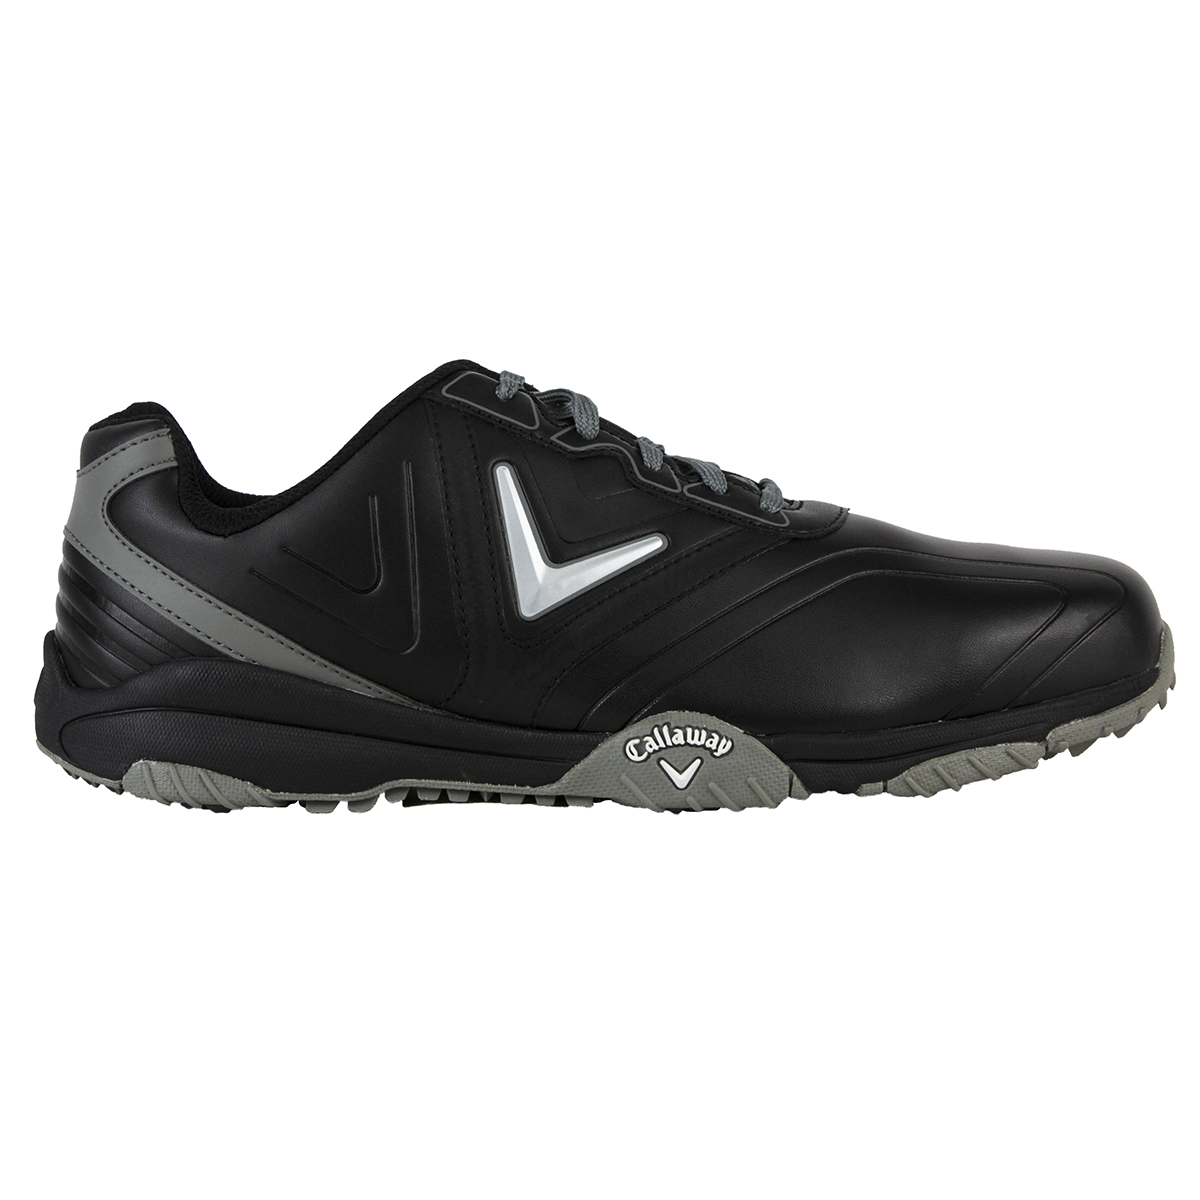 7e906cbfca3 Callaway Chev Comfort Golf Shoes Black silver 13